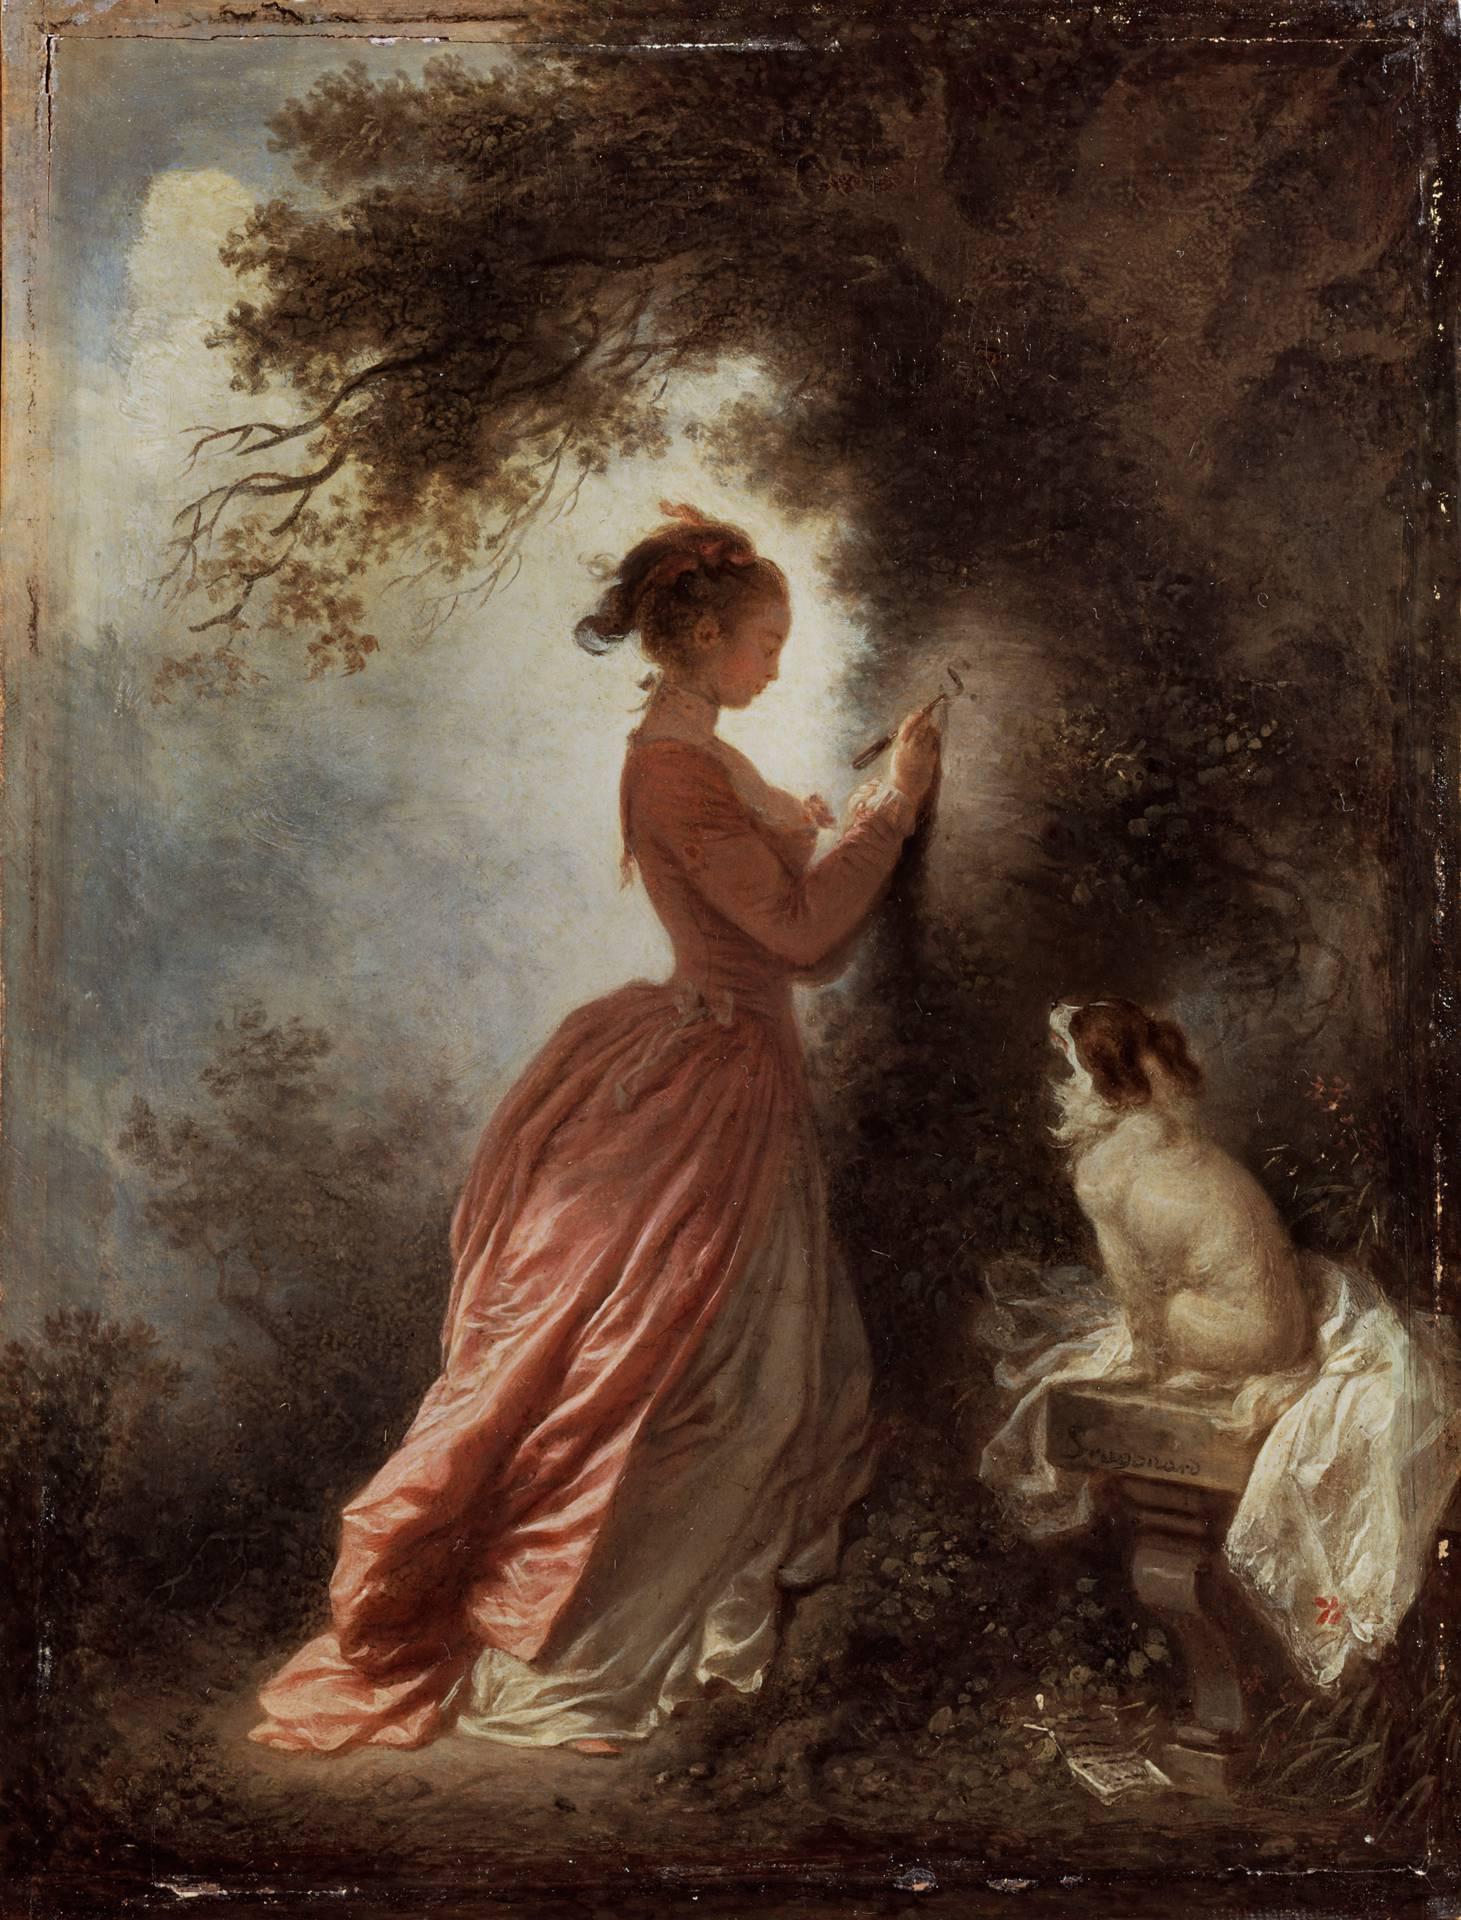 Jean-Honoré Fragonard (1732 - 1806), The Souvenir, c.1775 - 1780